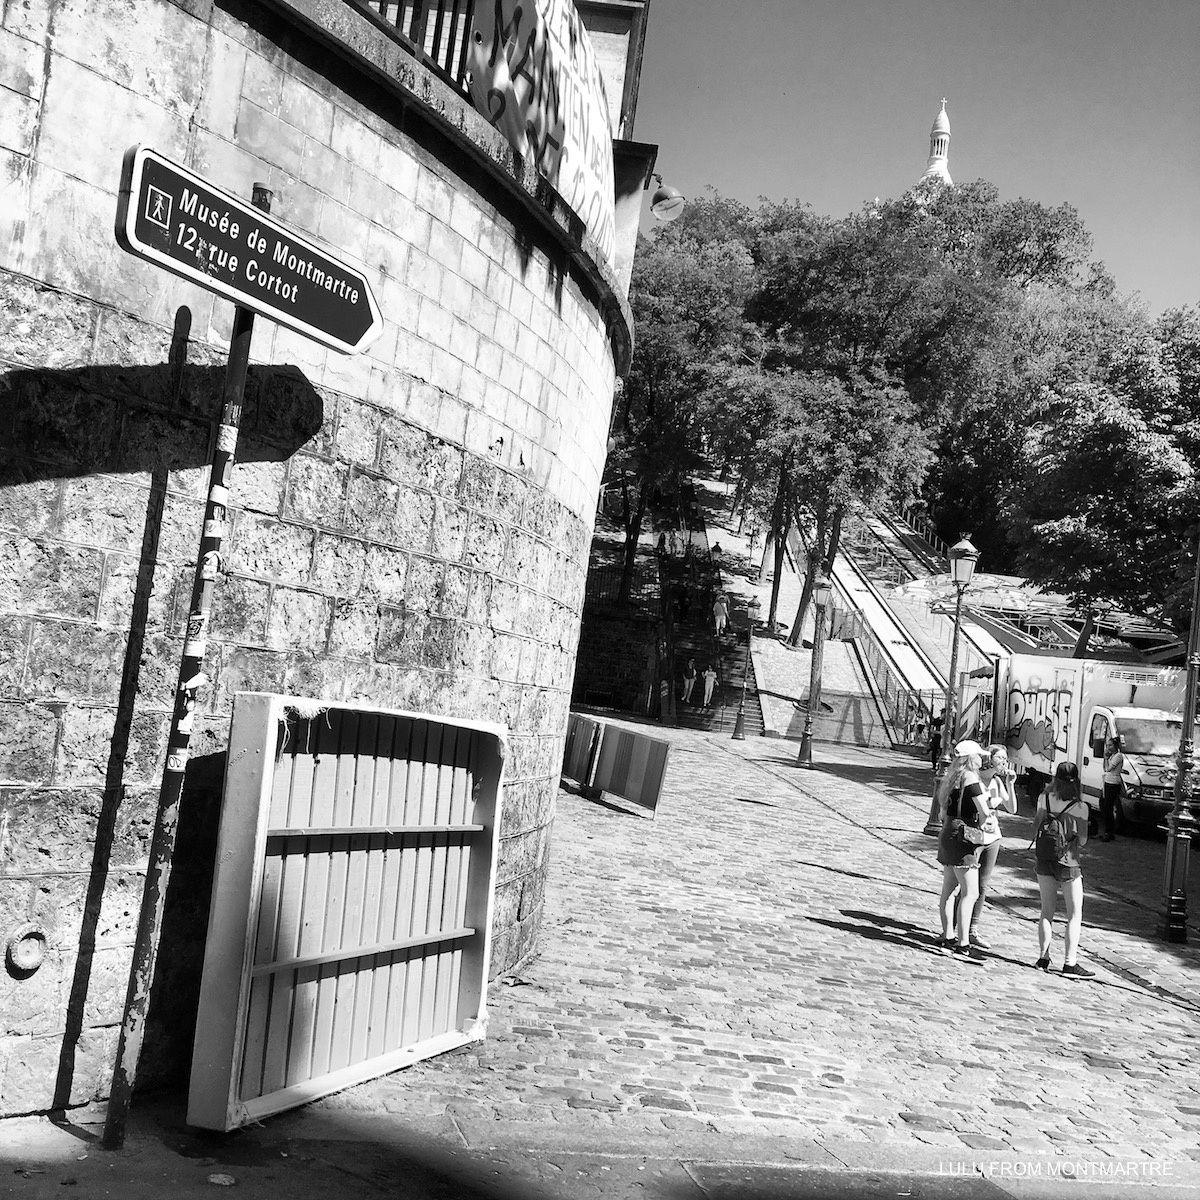 05. Lost in Montmartre, 75018